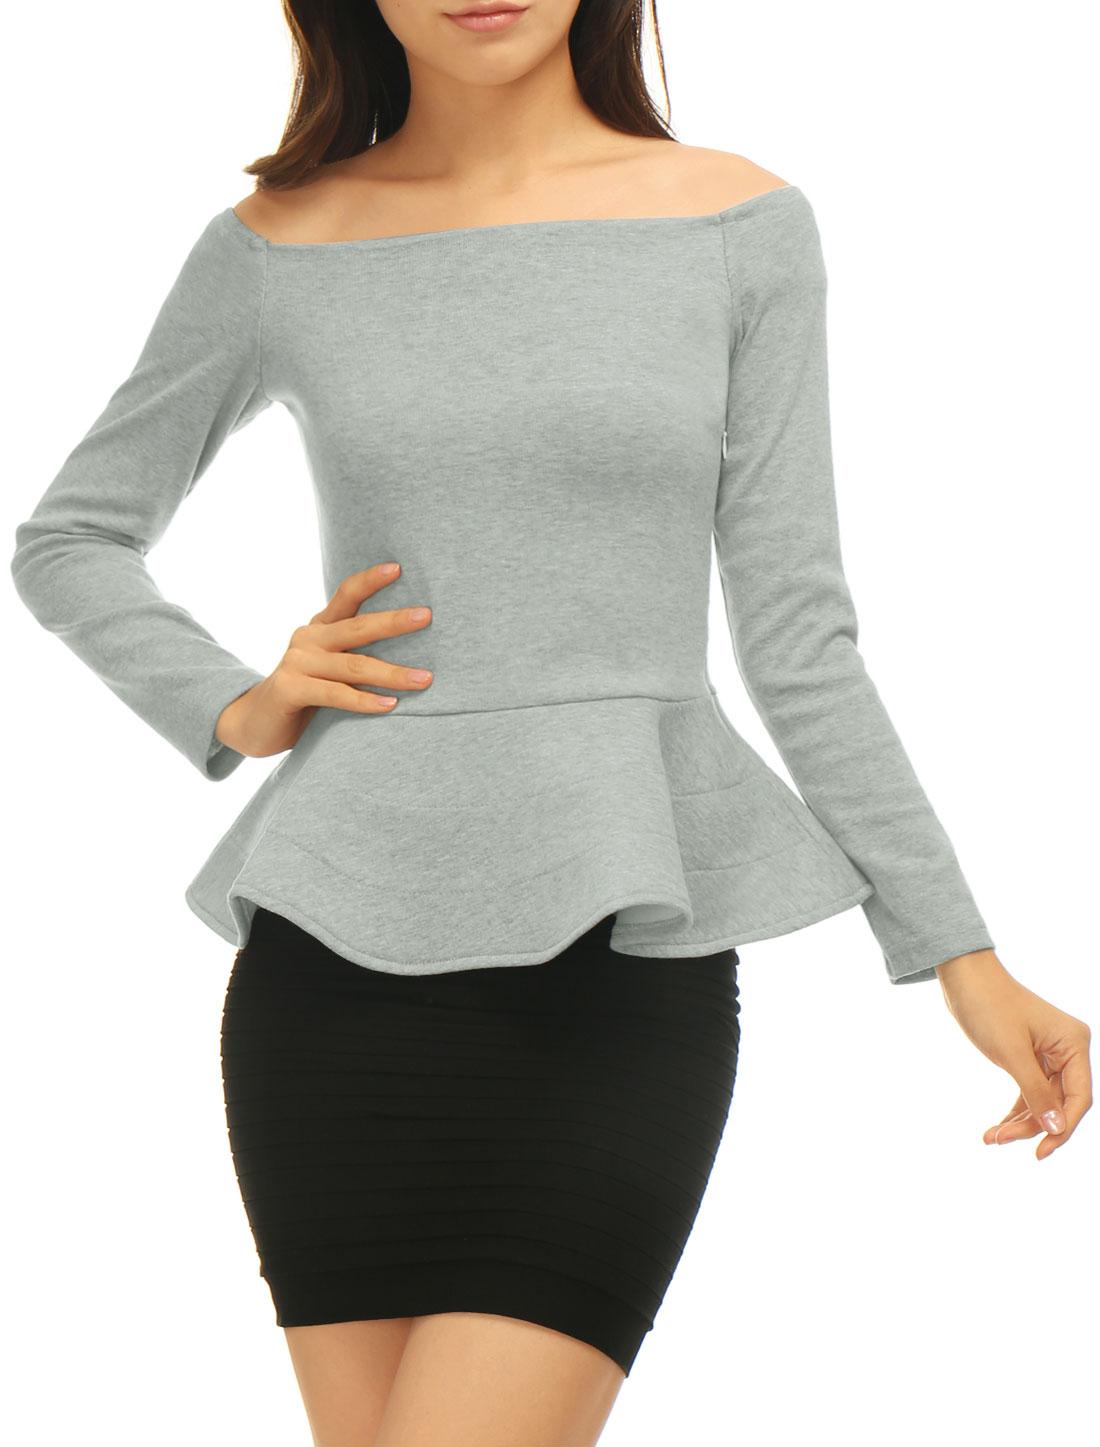 Allegra K Women Off Shoulder Long Sleeves Slim Fit Peplum Top Gray XS